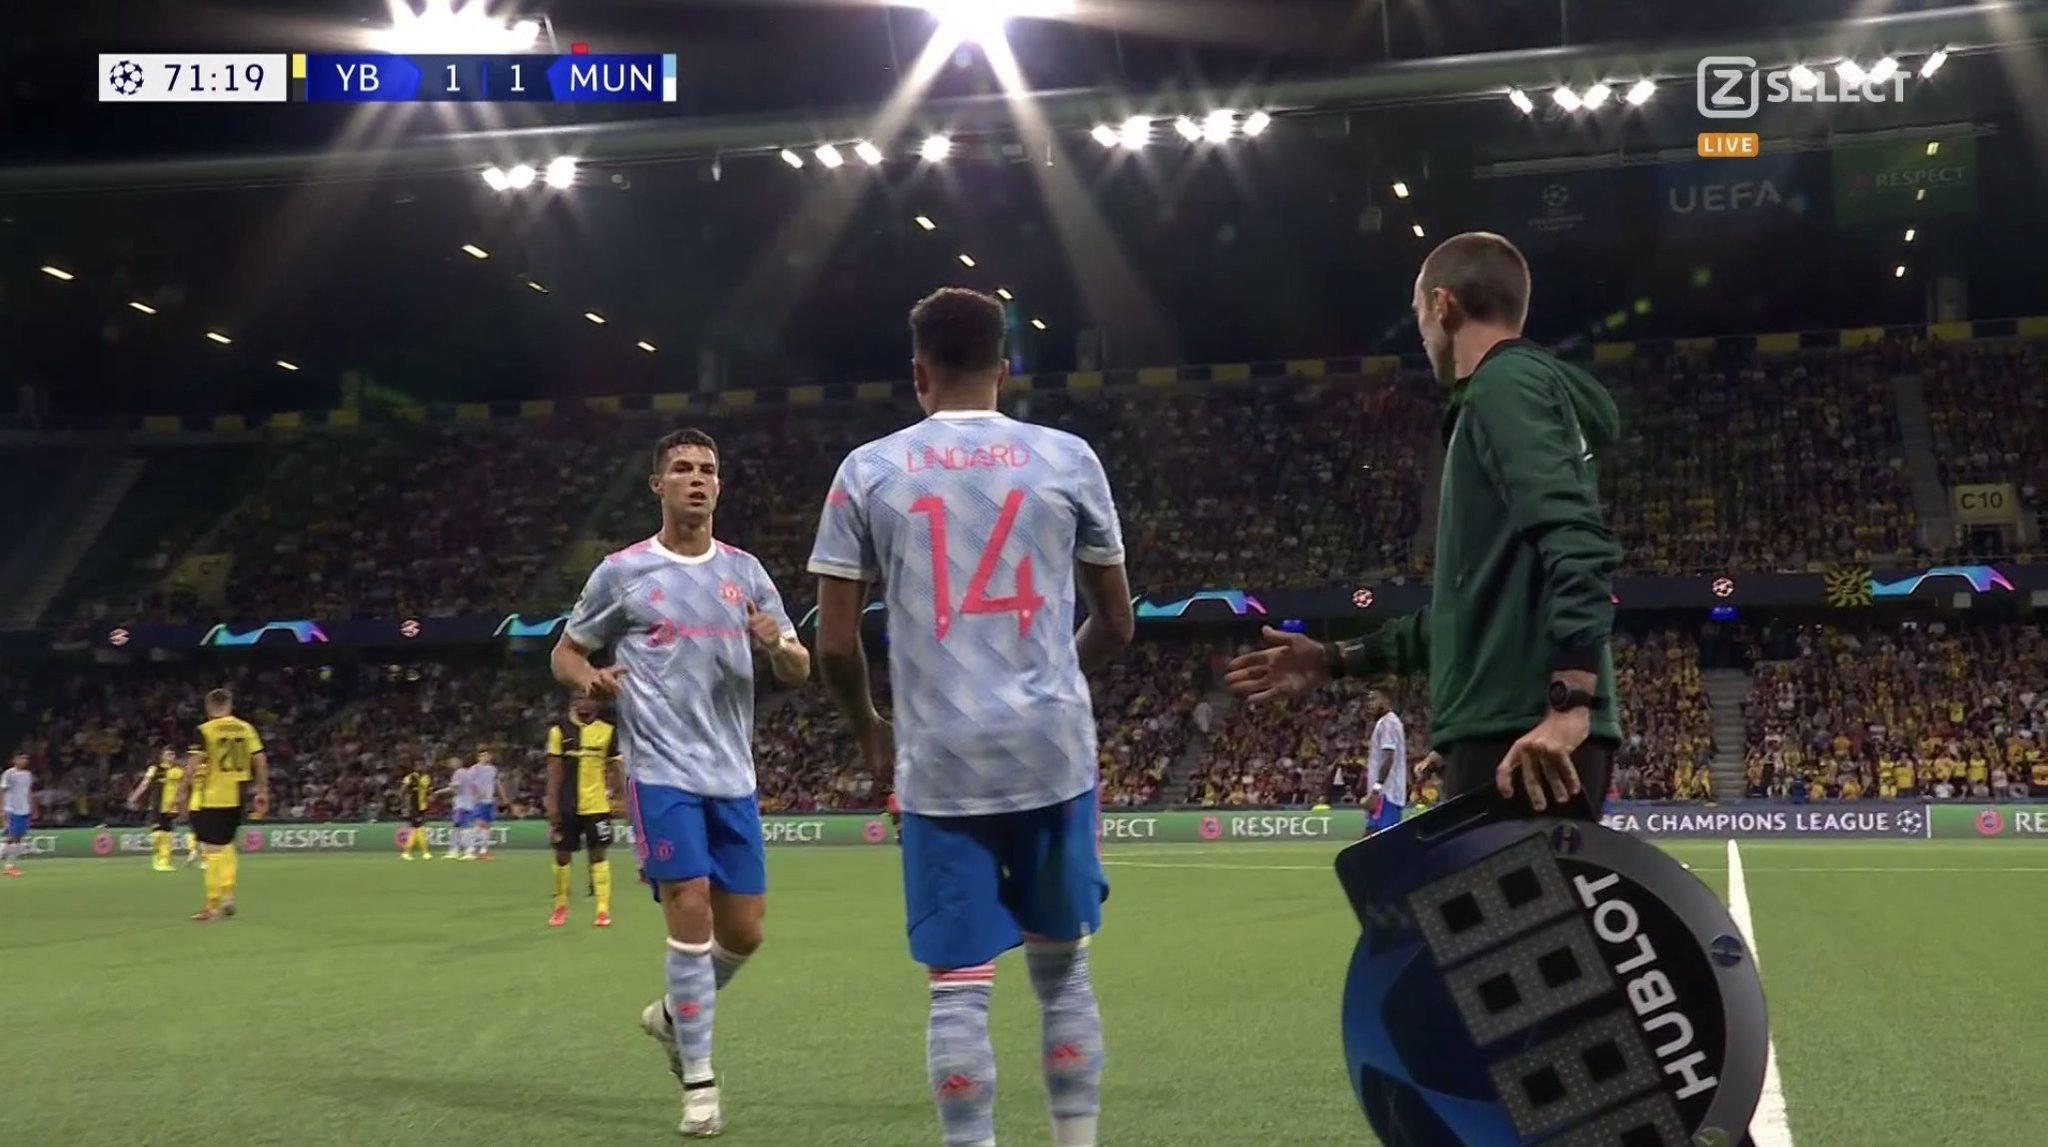 Lingard replaced Ronaldo